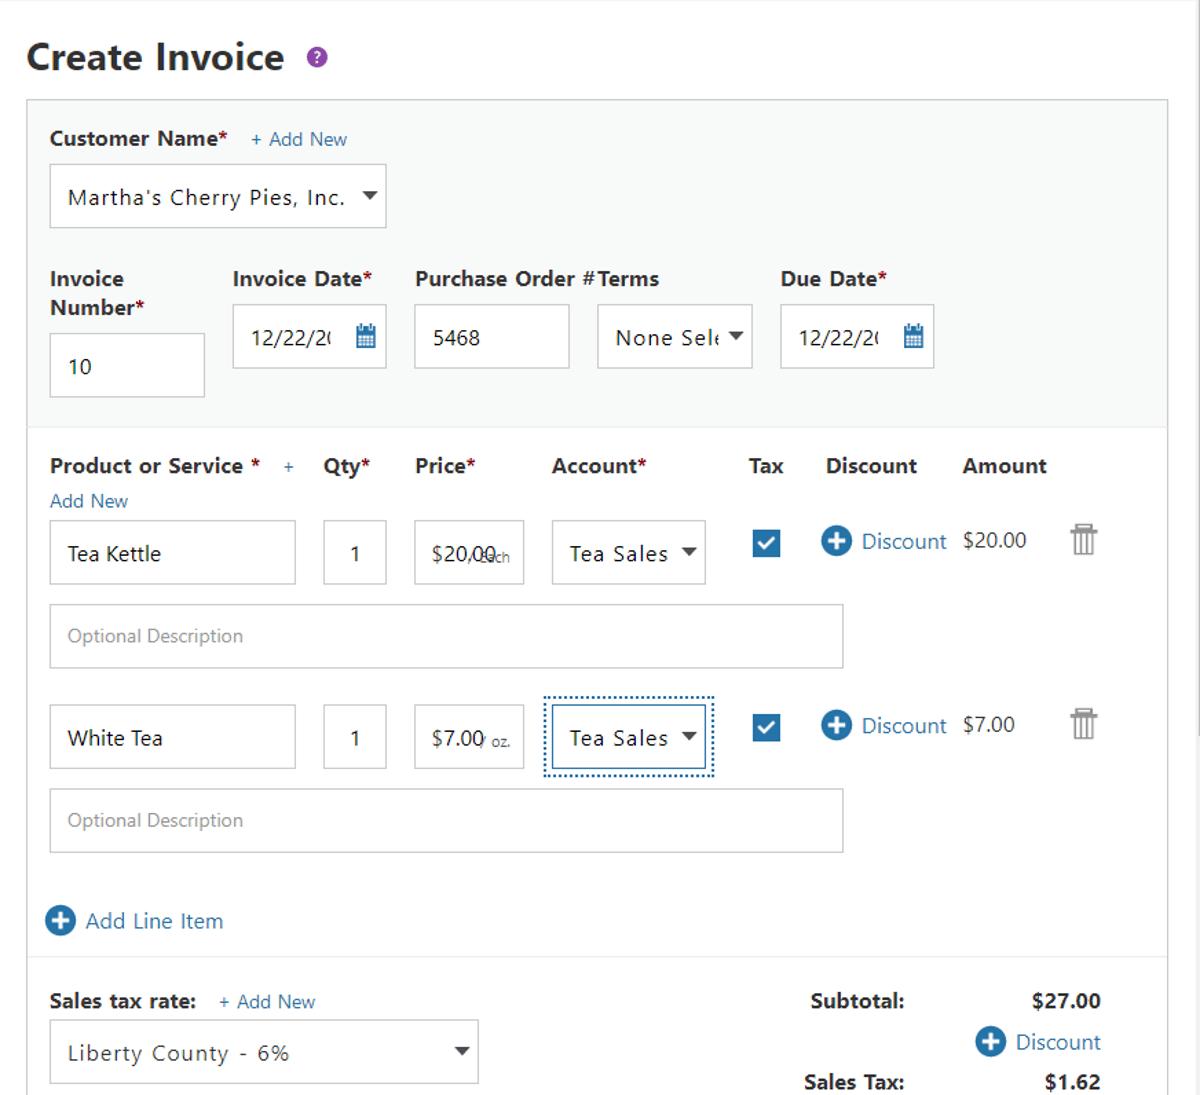 patriot software boleh buat potongan harga di invois